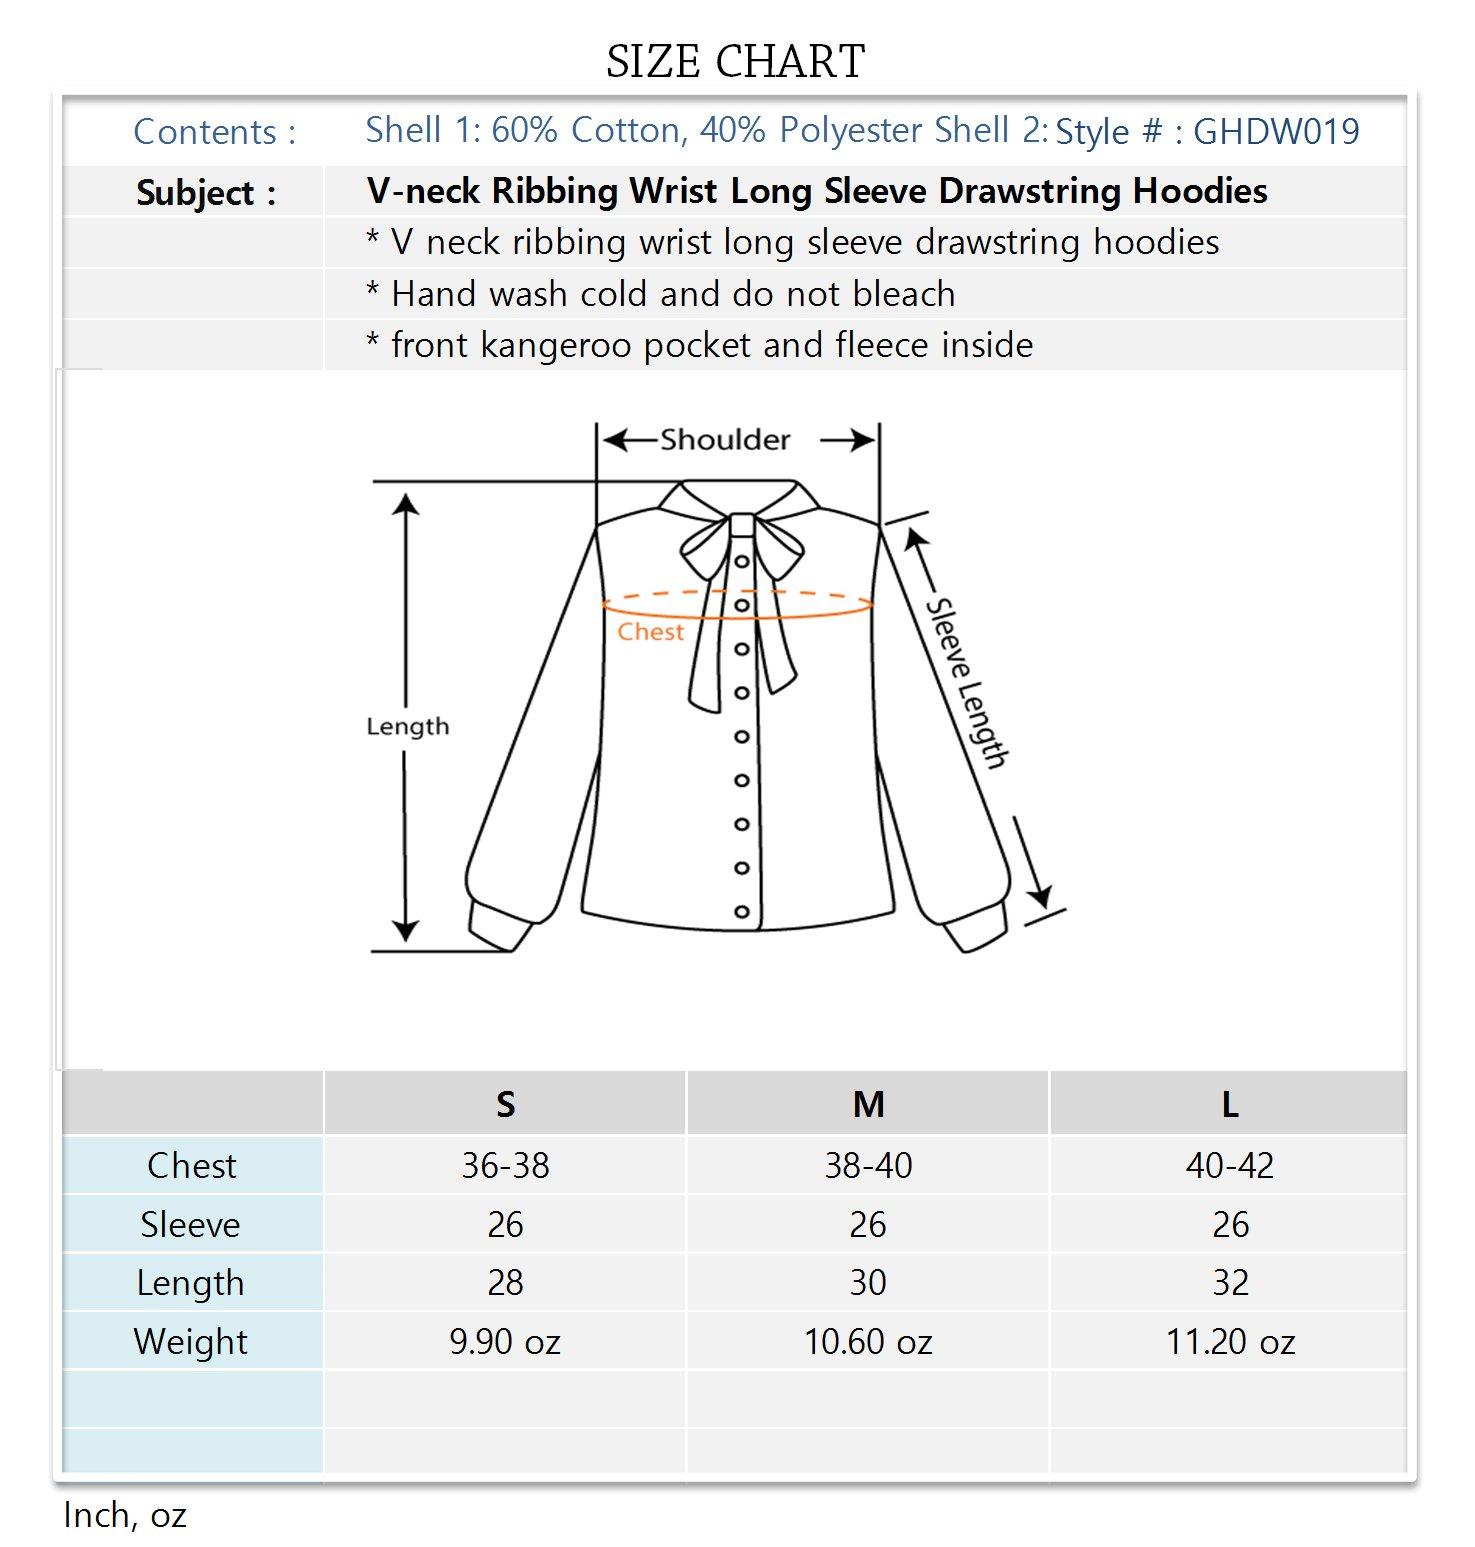 V-neck Ribbing Wrist Long Sleeve Drawstring Hoodies White Large by Luna Flower (Image #5)